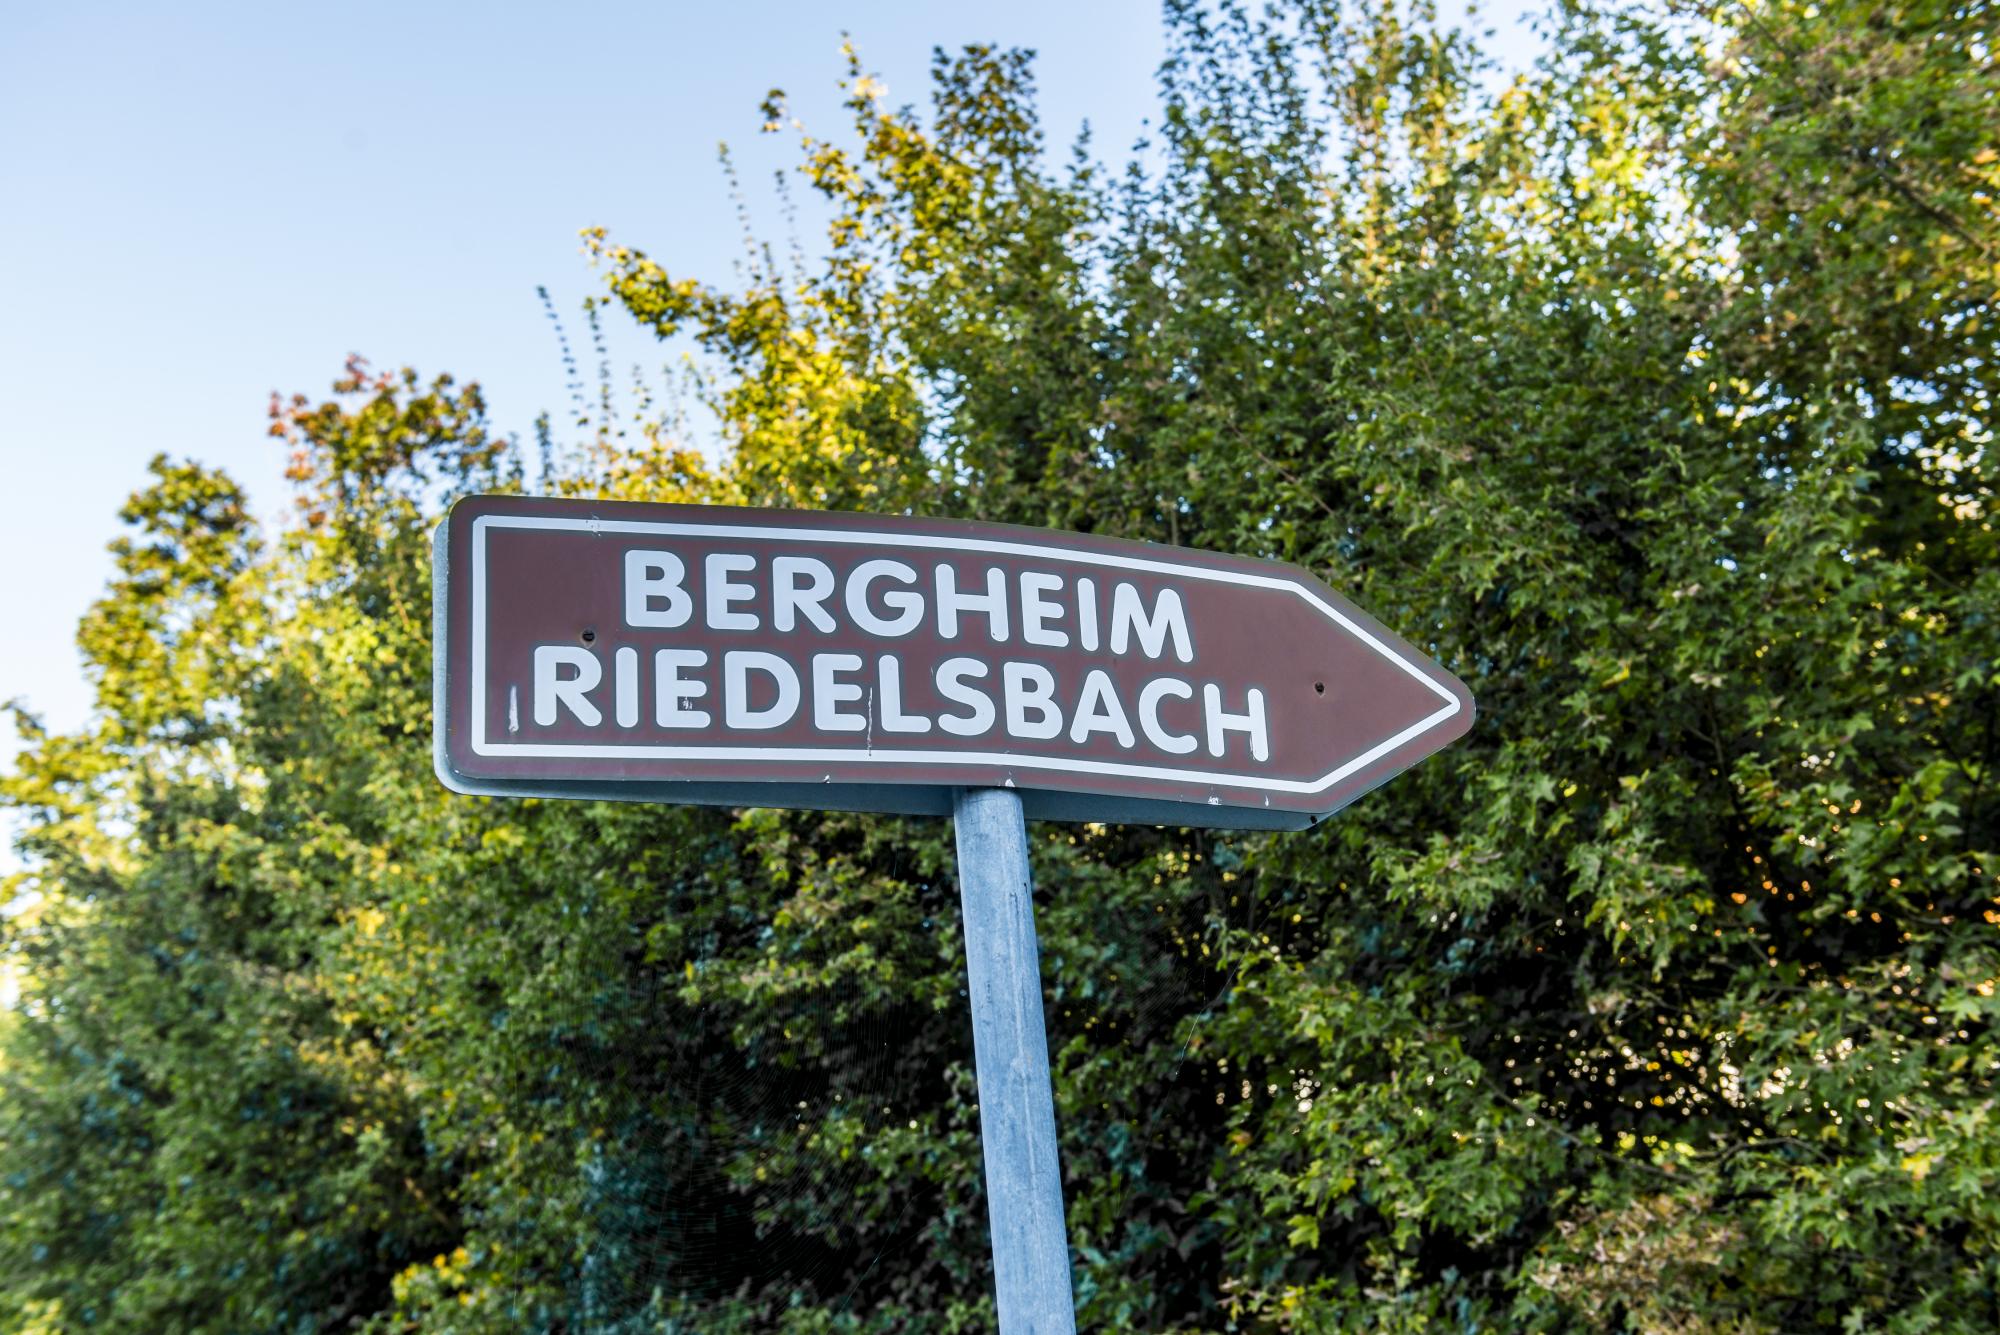 Bergheim Riedelsbach